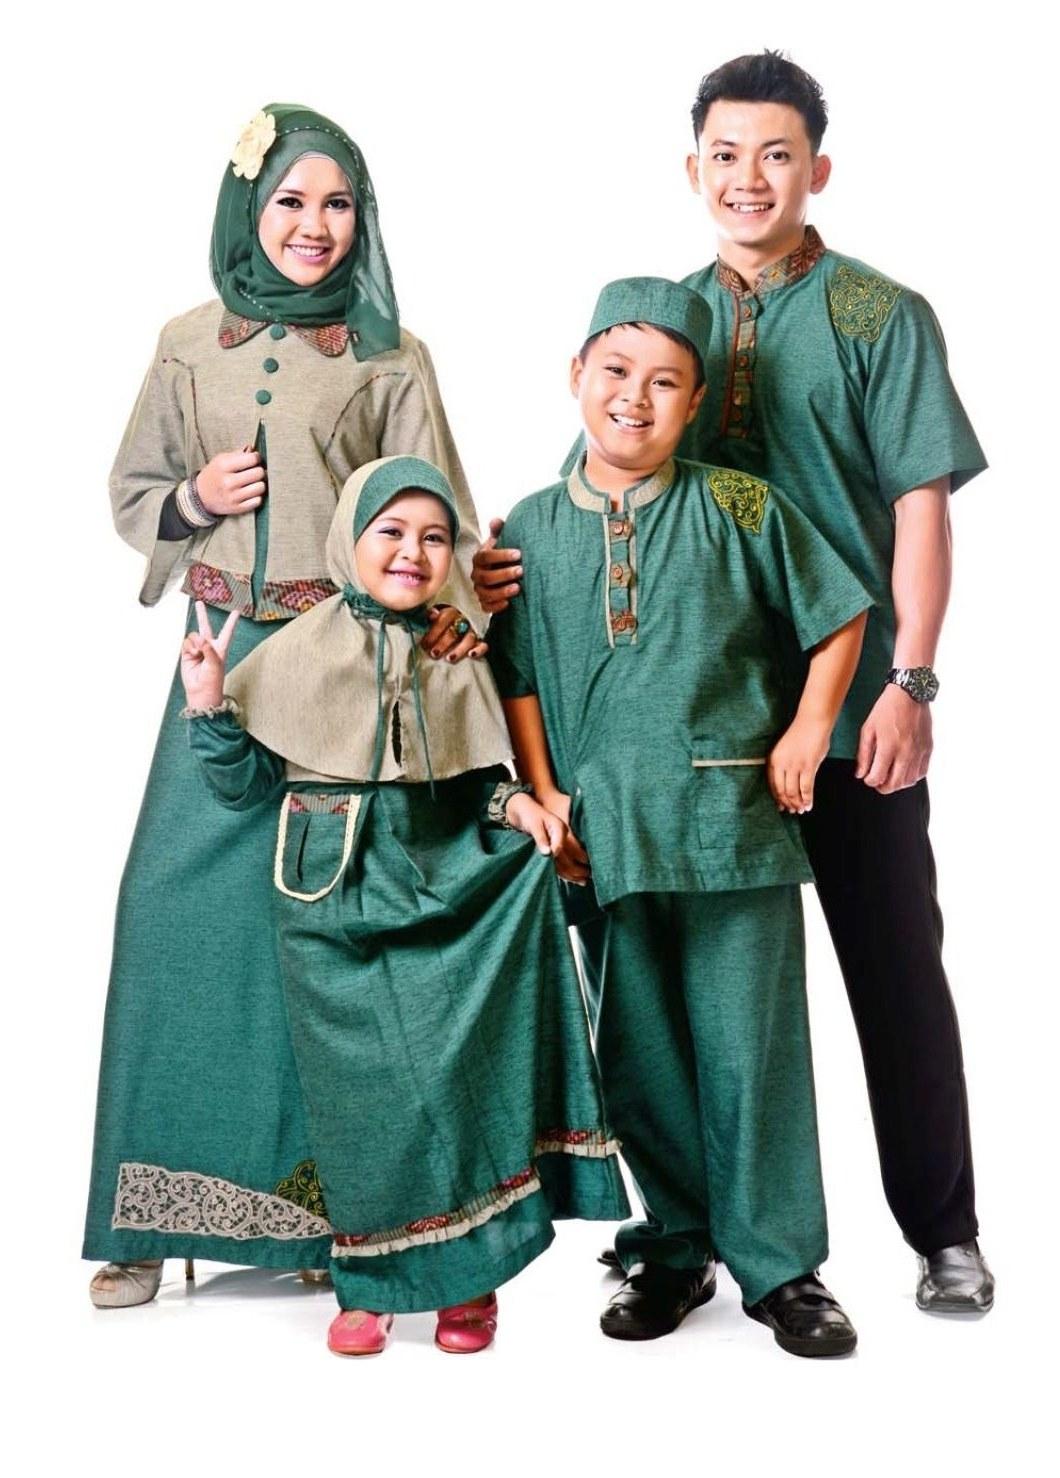 Bentuk Koleksi Baju Lebaran 2019 8ydm 40 Baju Seragam Keluarga Lebaran 2020 Inspirasi Terbaru